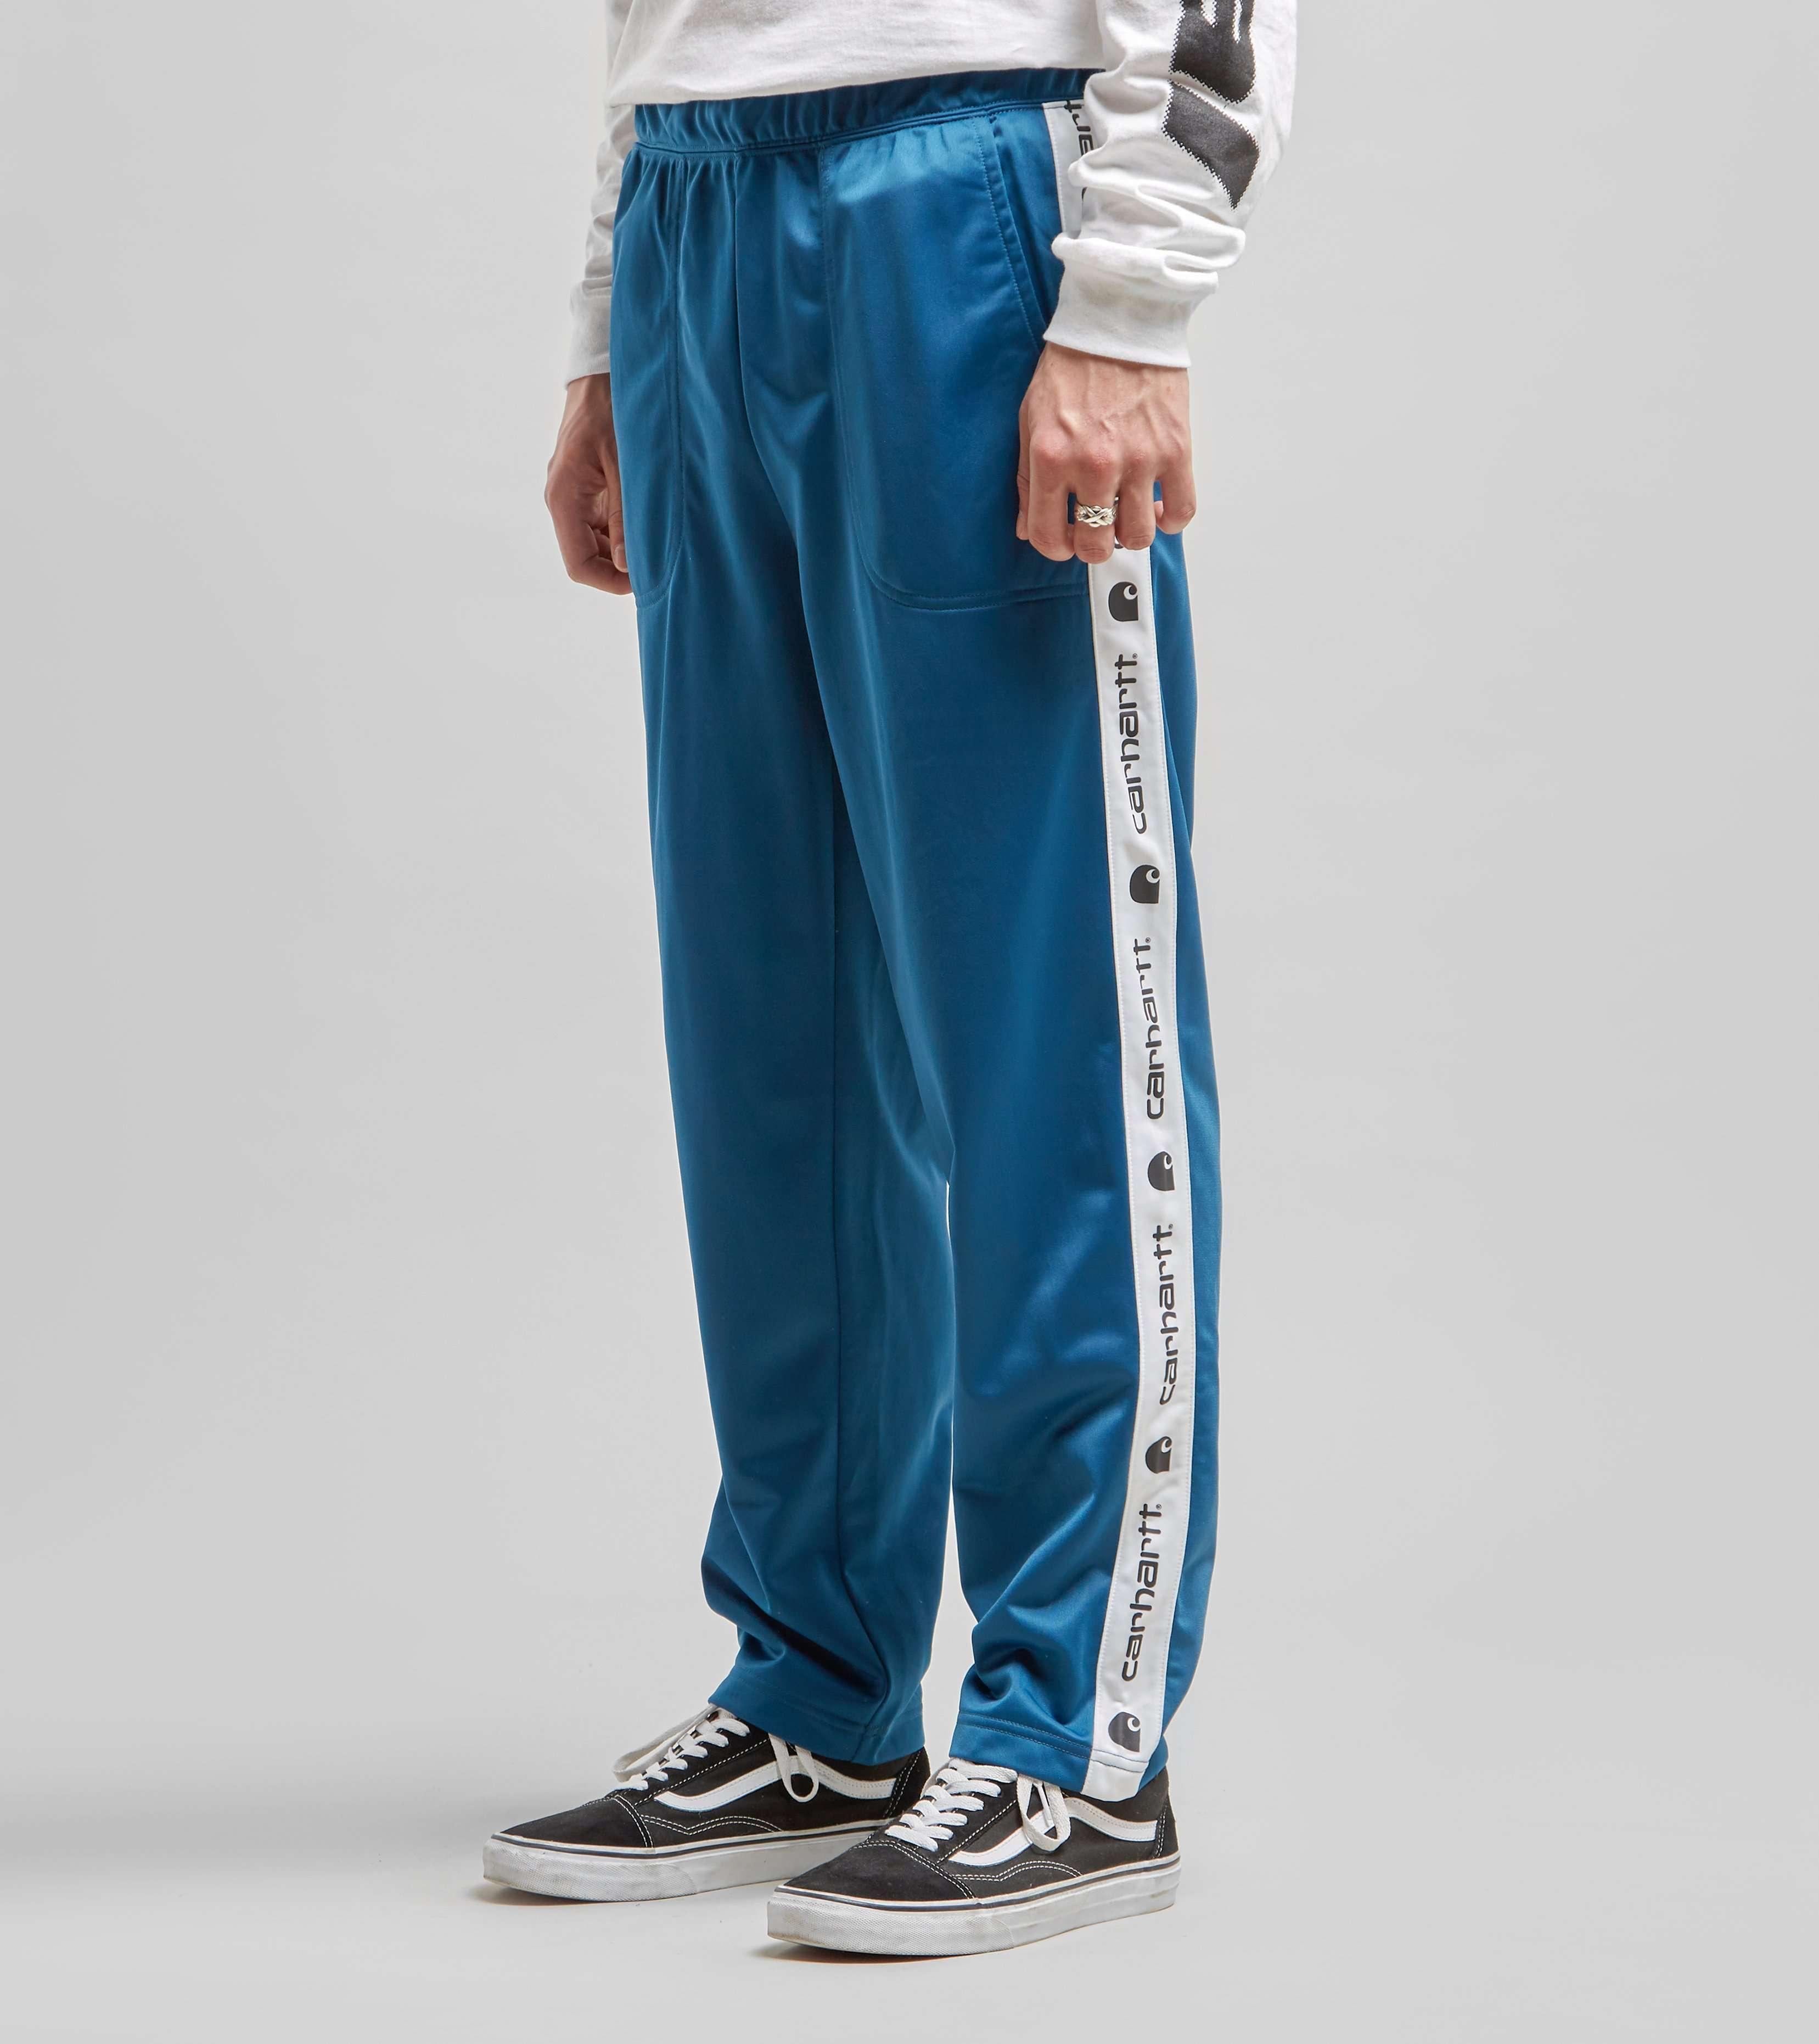 Carhartt WIP Goodwin Track Pants